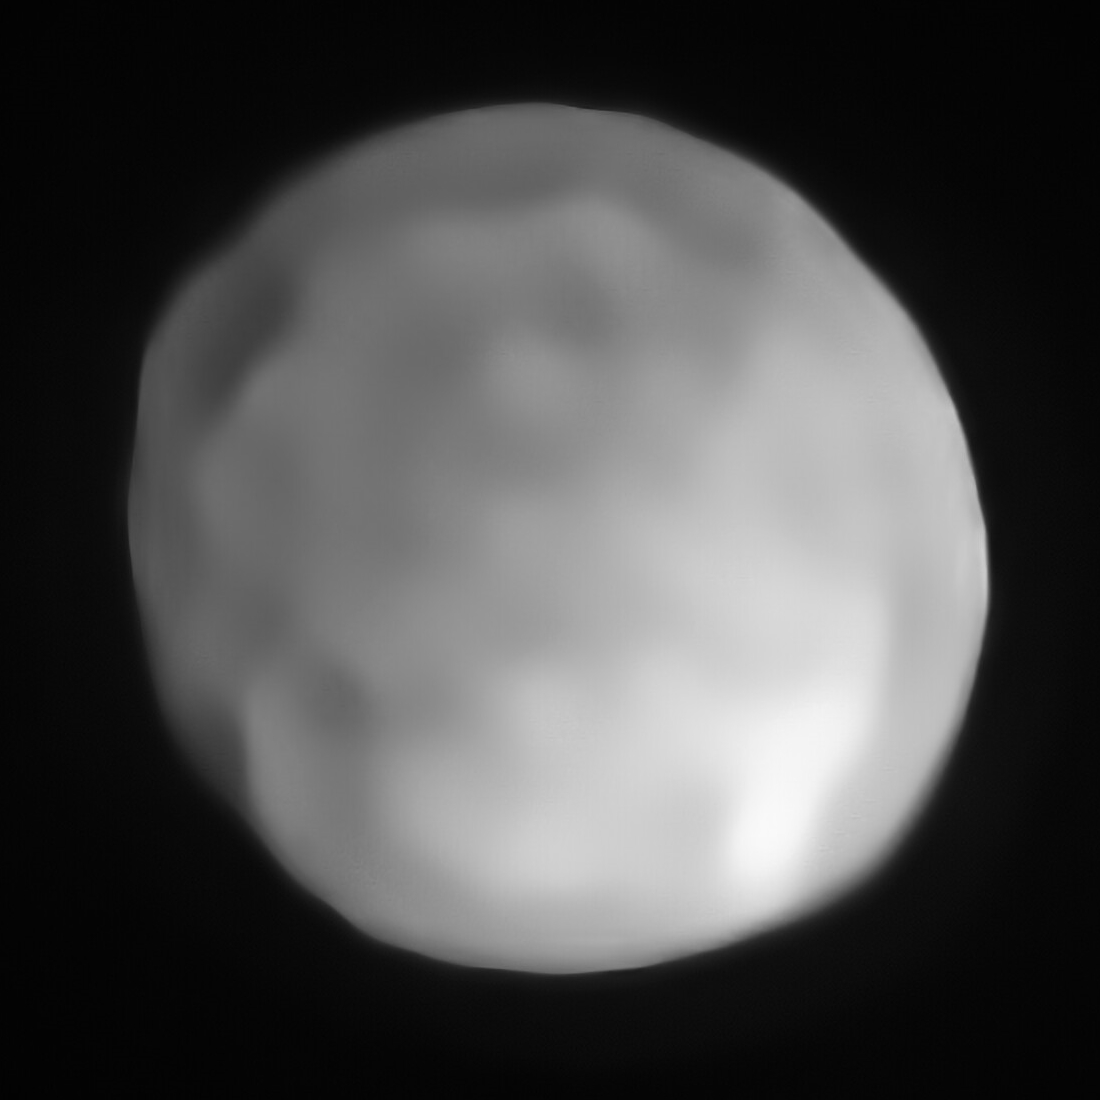 https://upload.wikimedia.org/wikipedia/commons/8/88/SPHERE_image_of_Hygiea.jpg